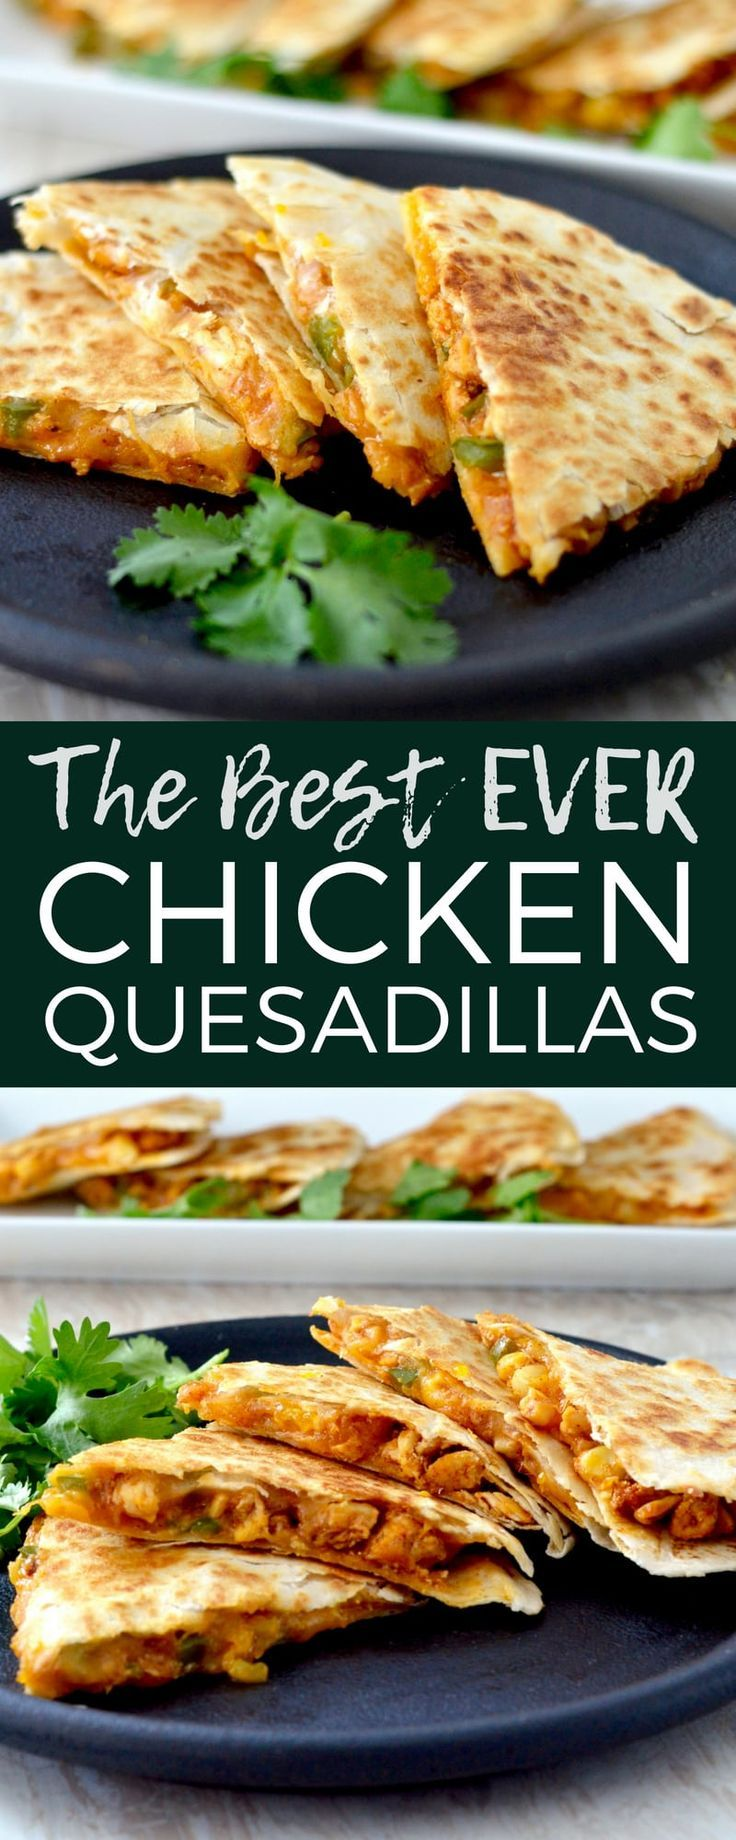 This is the Best Chicken Quesadilla Recipe EVER! It's a unique, quick, easy, del…